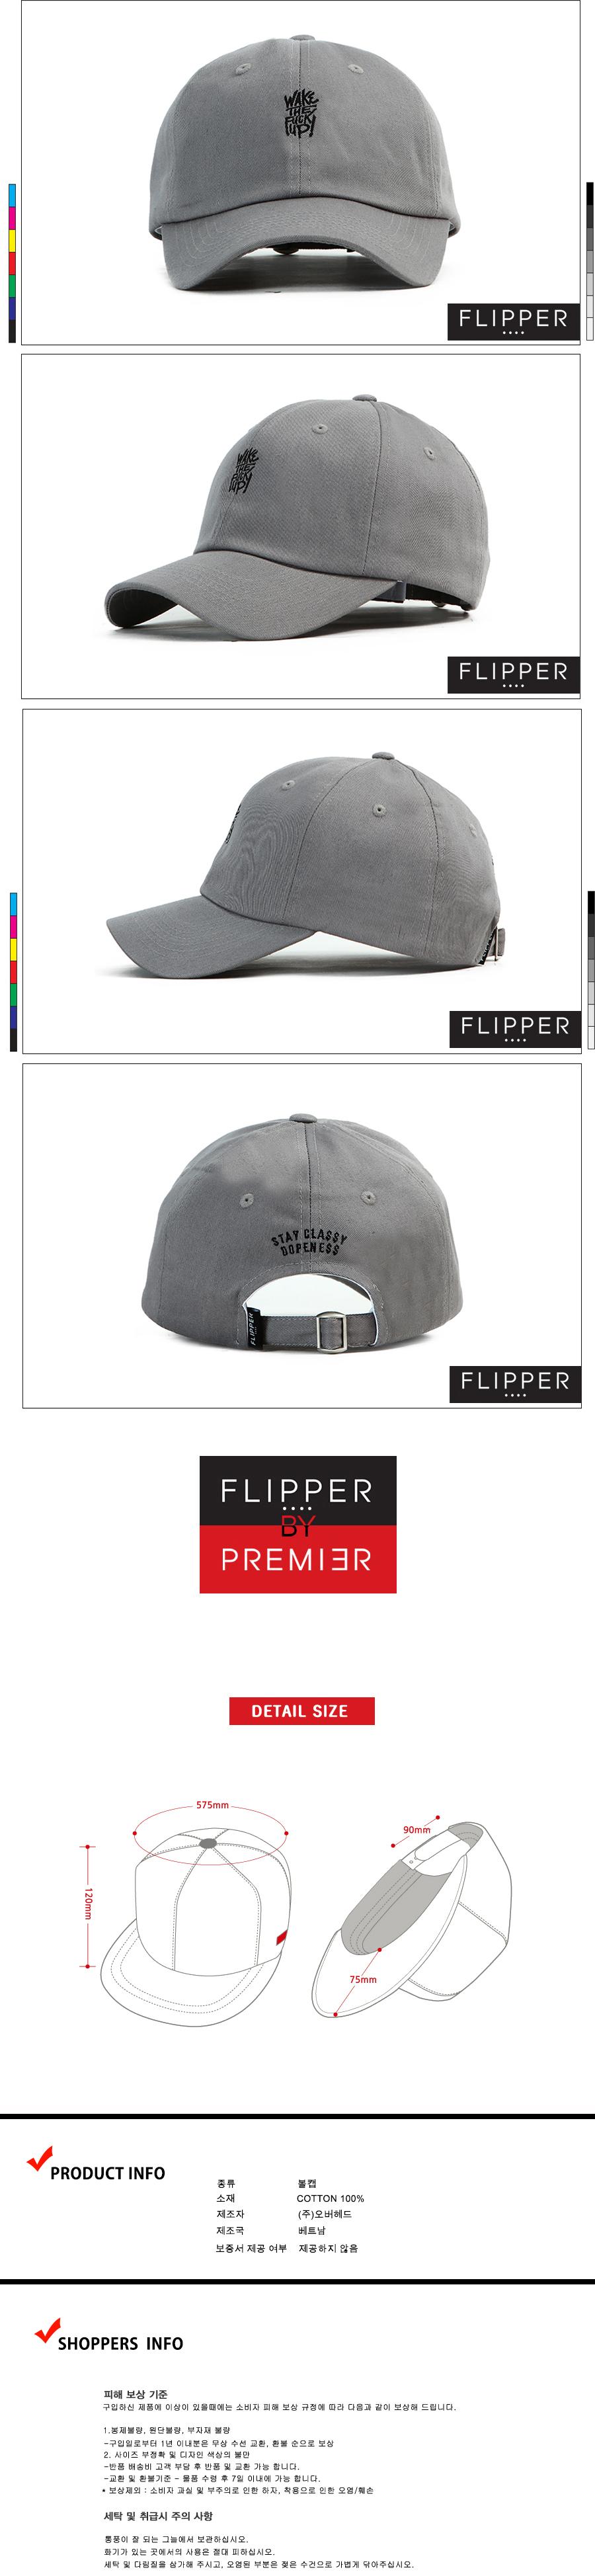 [ PREMIER ] [Premier] Flipper Ball Cap Wake Grey (FL174)